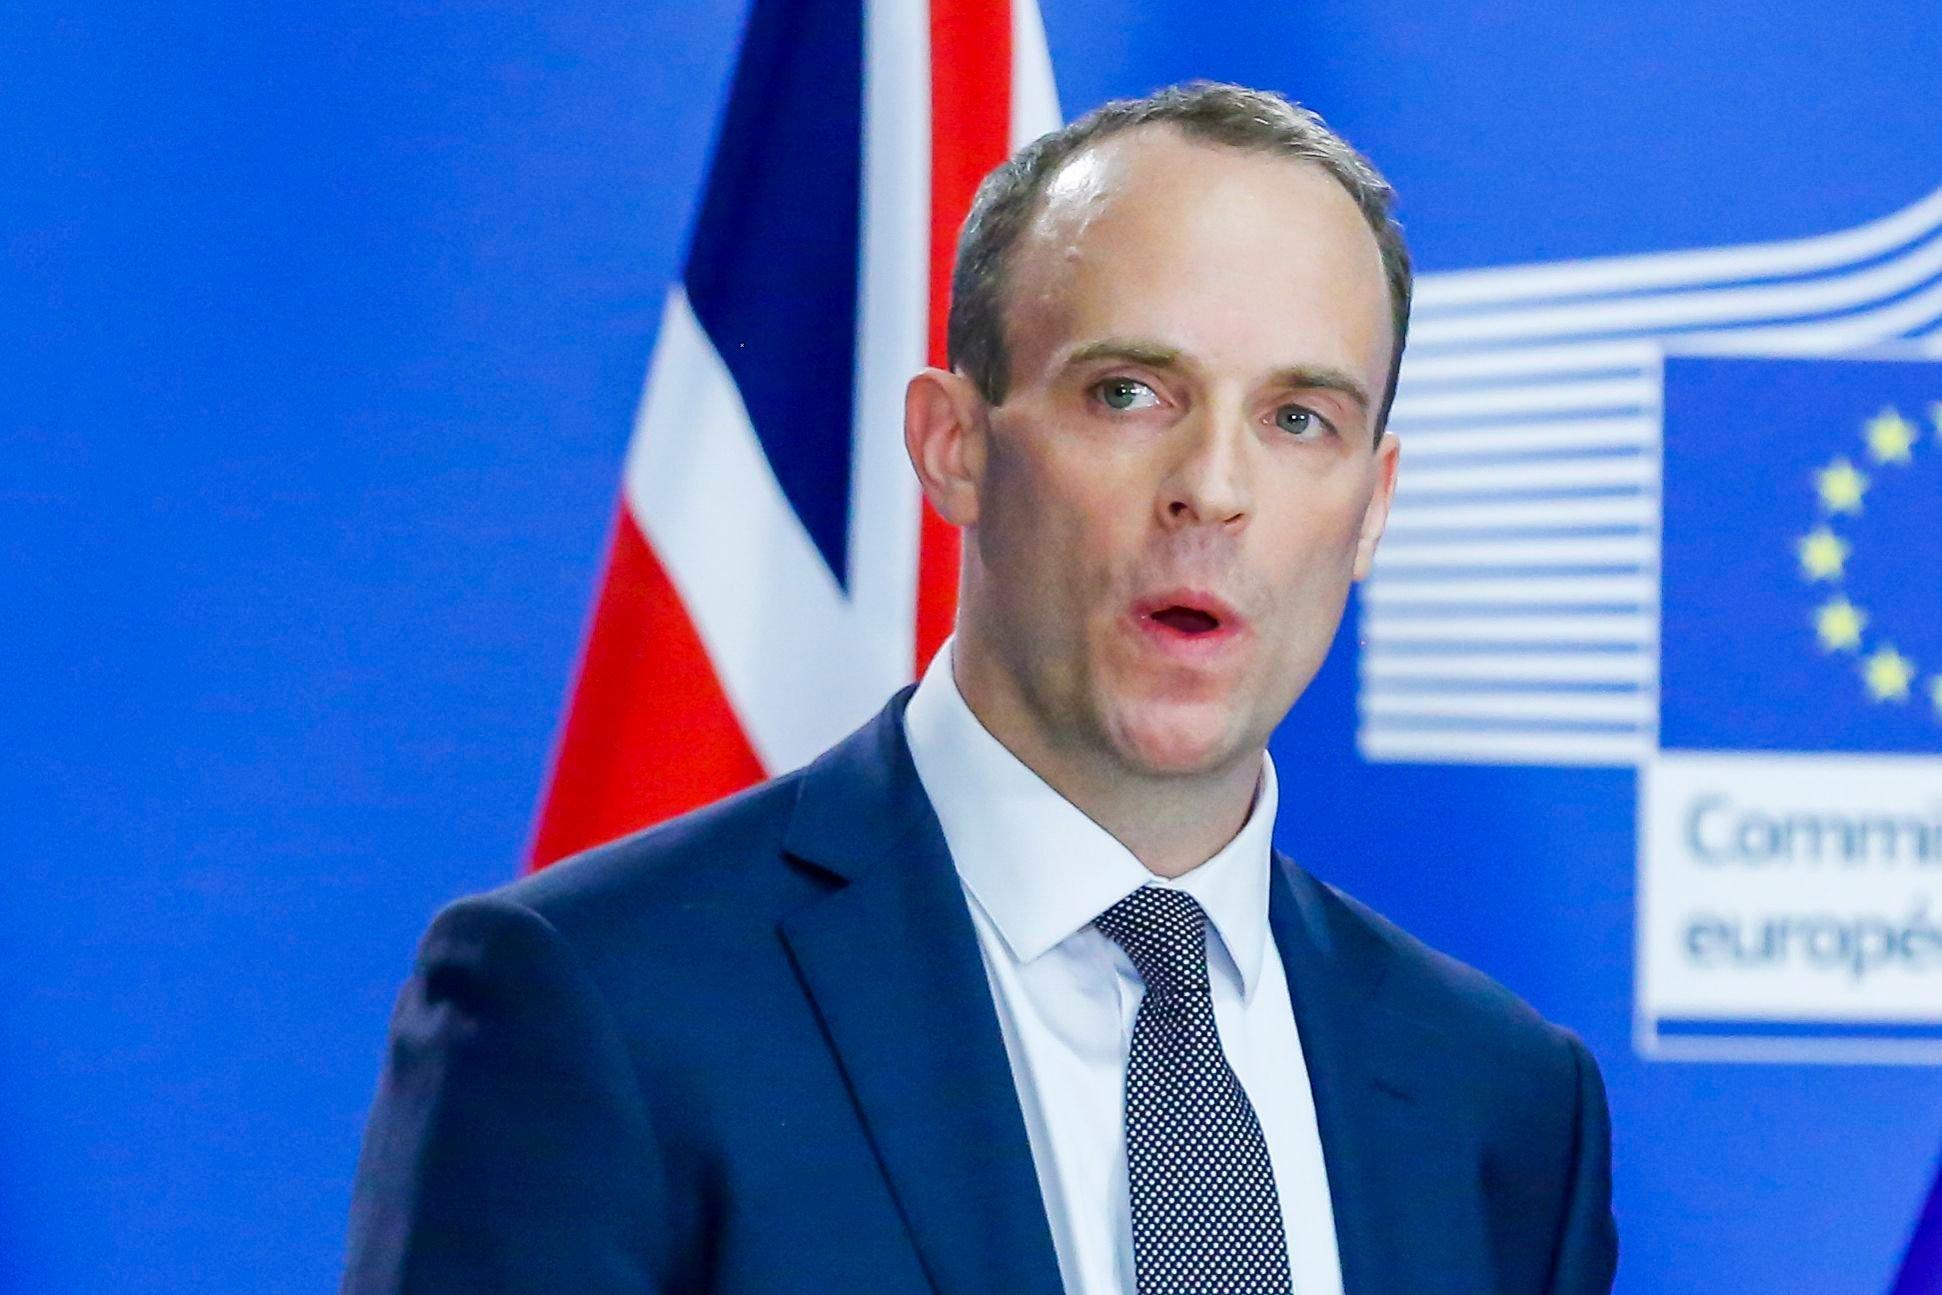 Mandatory Credit: Photo by Isopix/REX/Shutterstock (9771243w) Dominic Raab Article 50 Negotiations, Brussels, Belgium - 26 Jul 2018